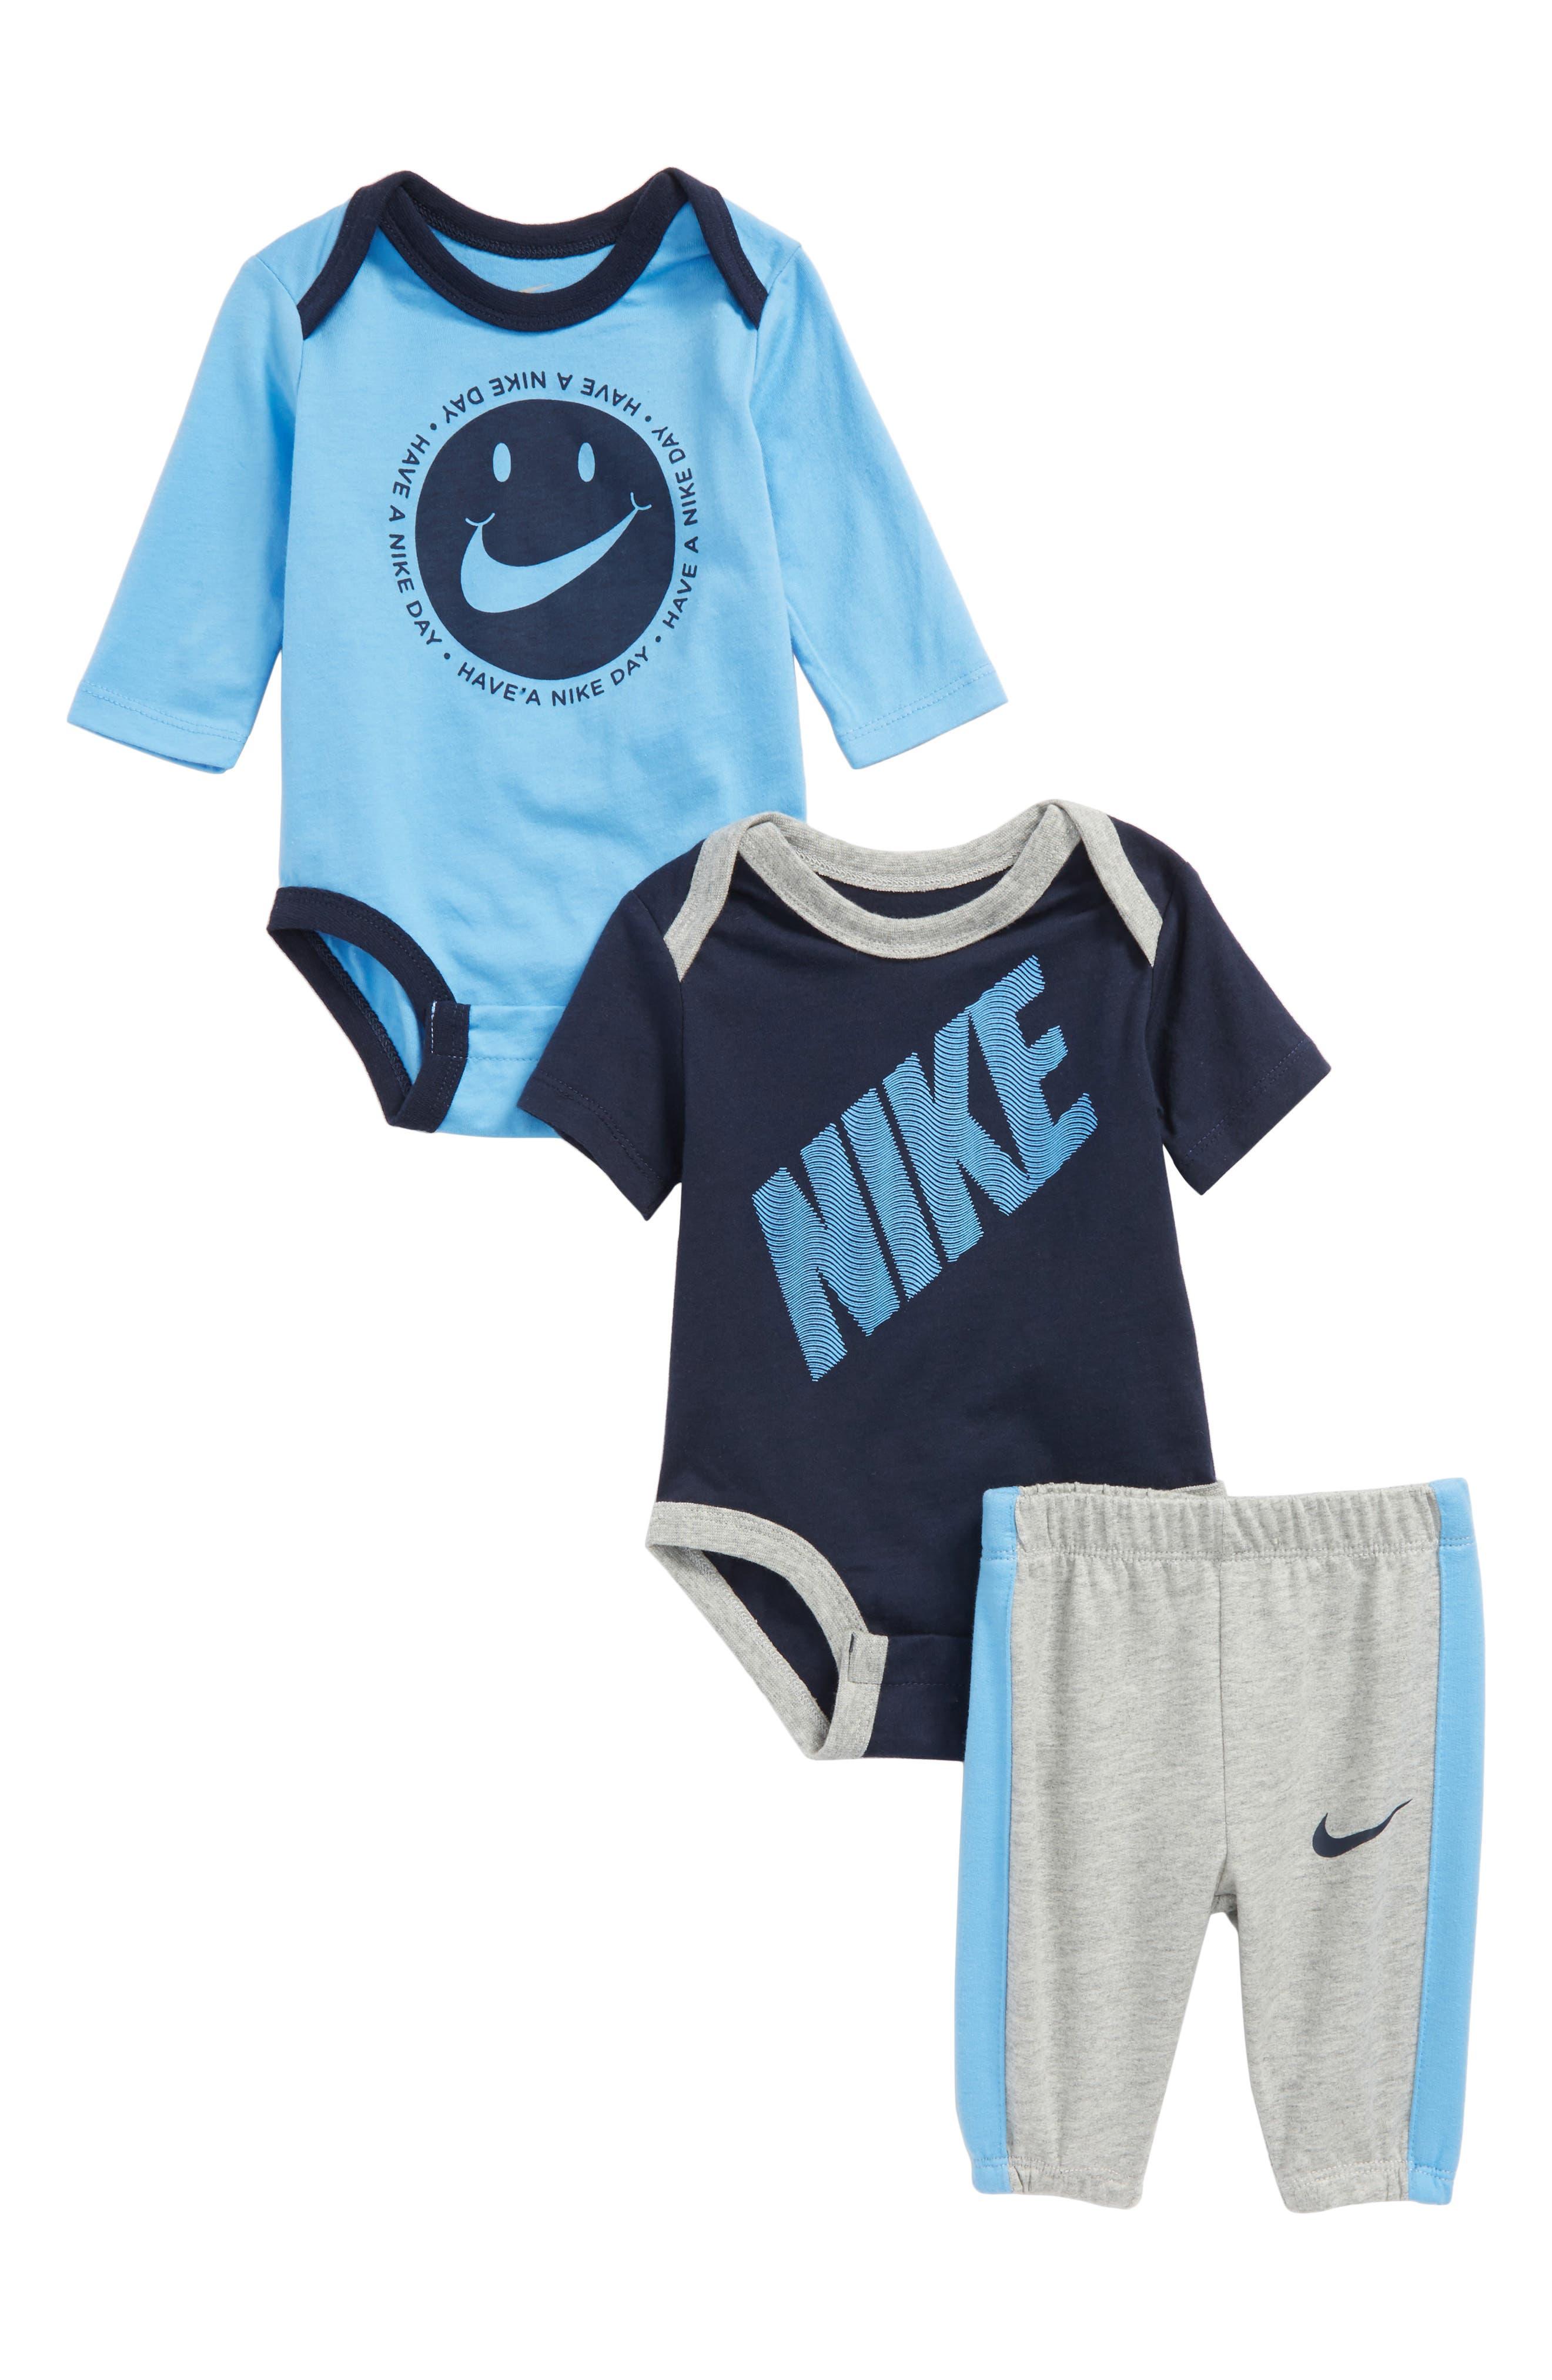 Main Image - Nike DNA 3-Piece Bodysuit & Pants Set (Baby Boys)